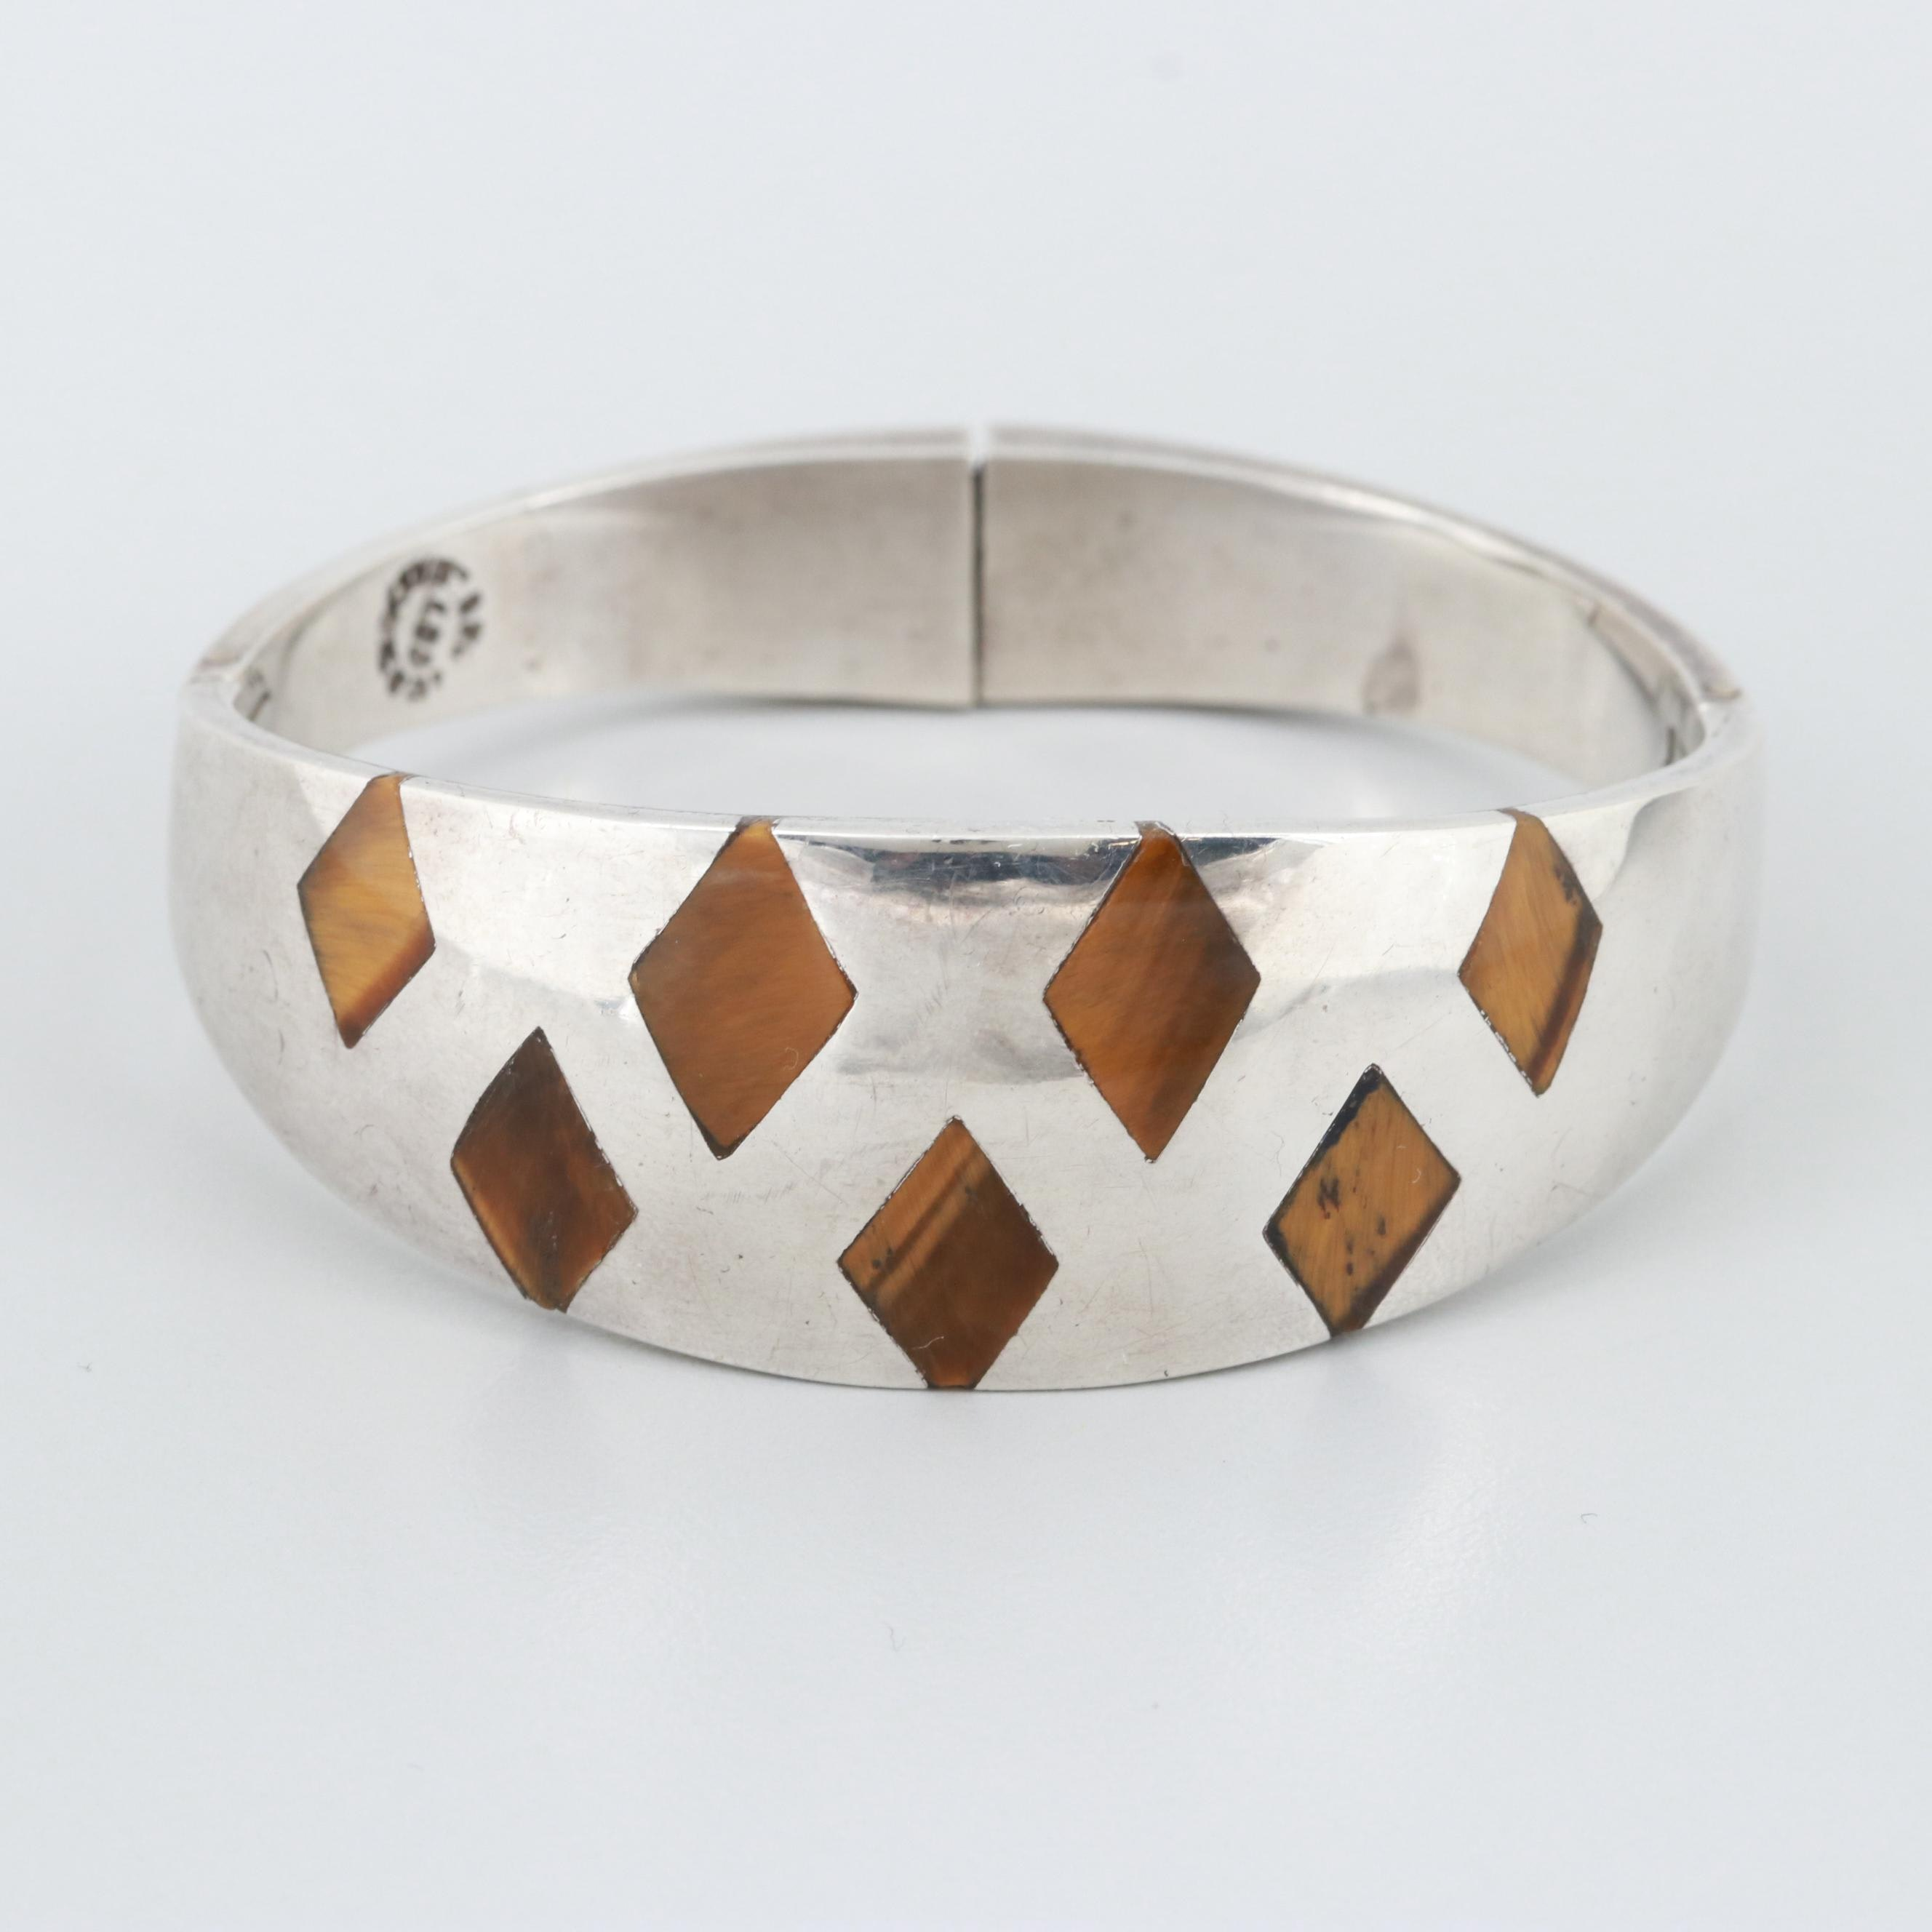 Taxco, Mexico Sterling Silver Tiger's Eye Cuff Bracelet